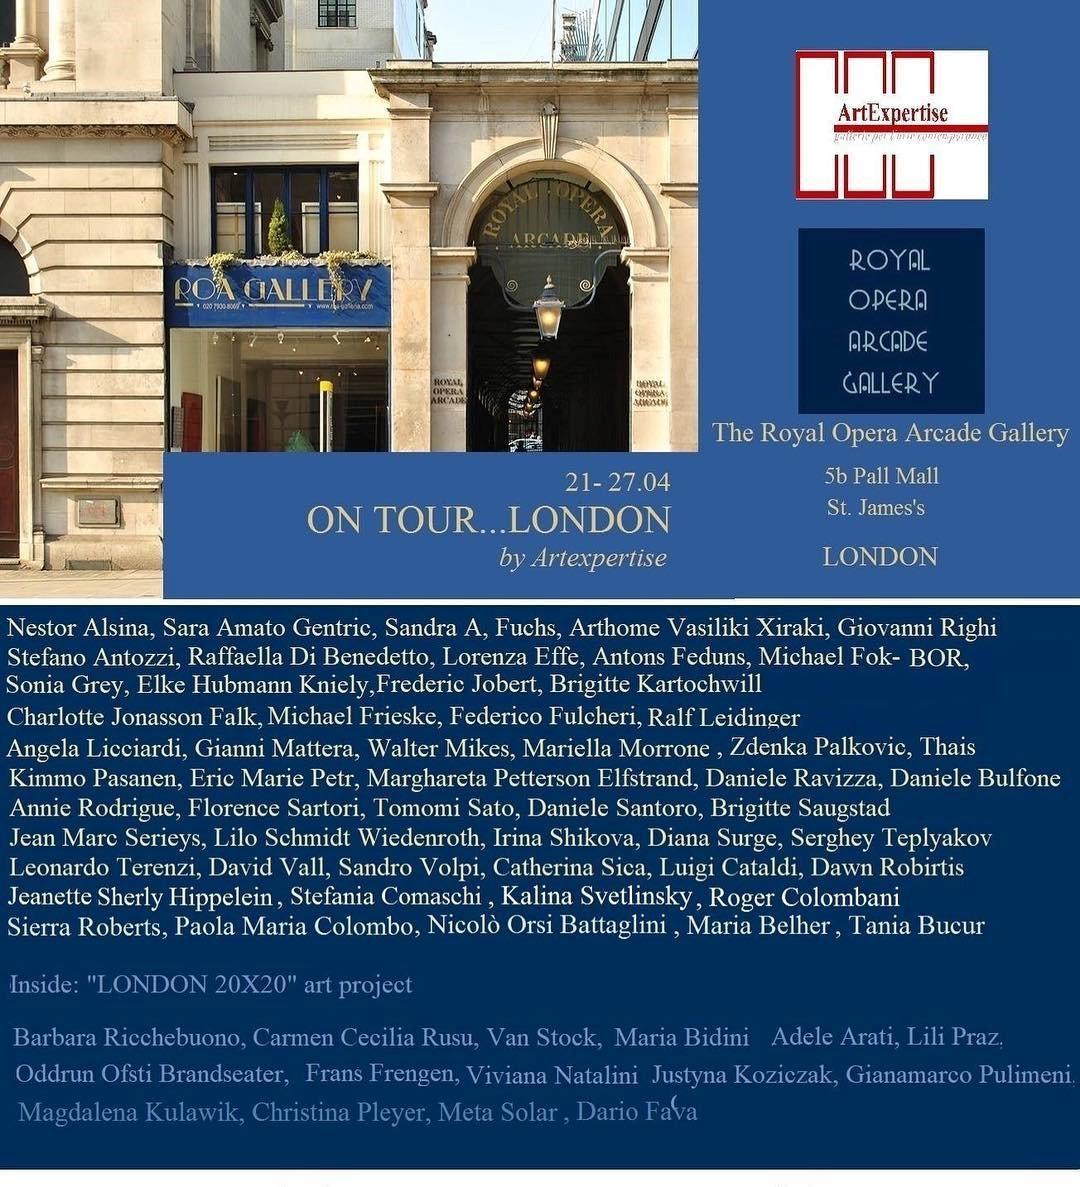 The Royal Opera Arcade Gallery